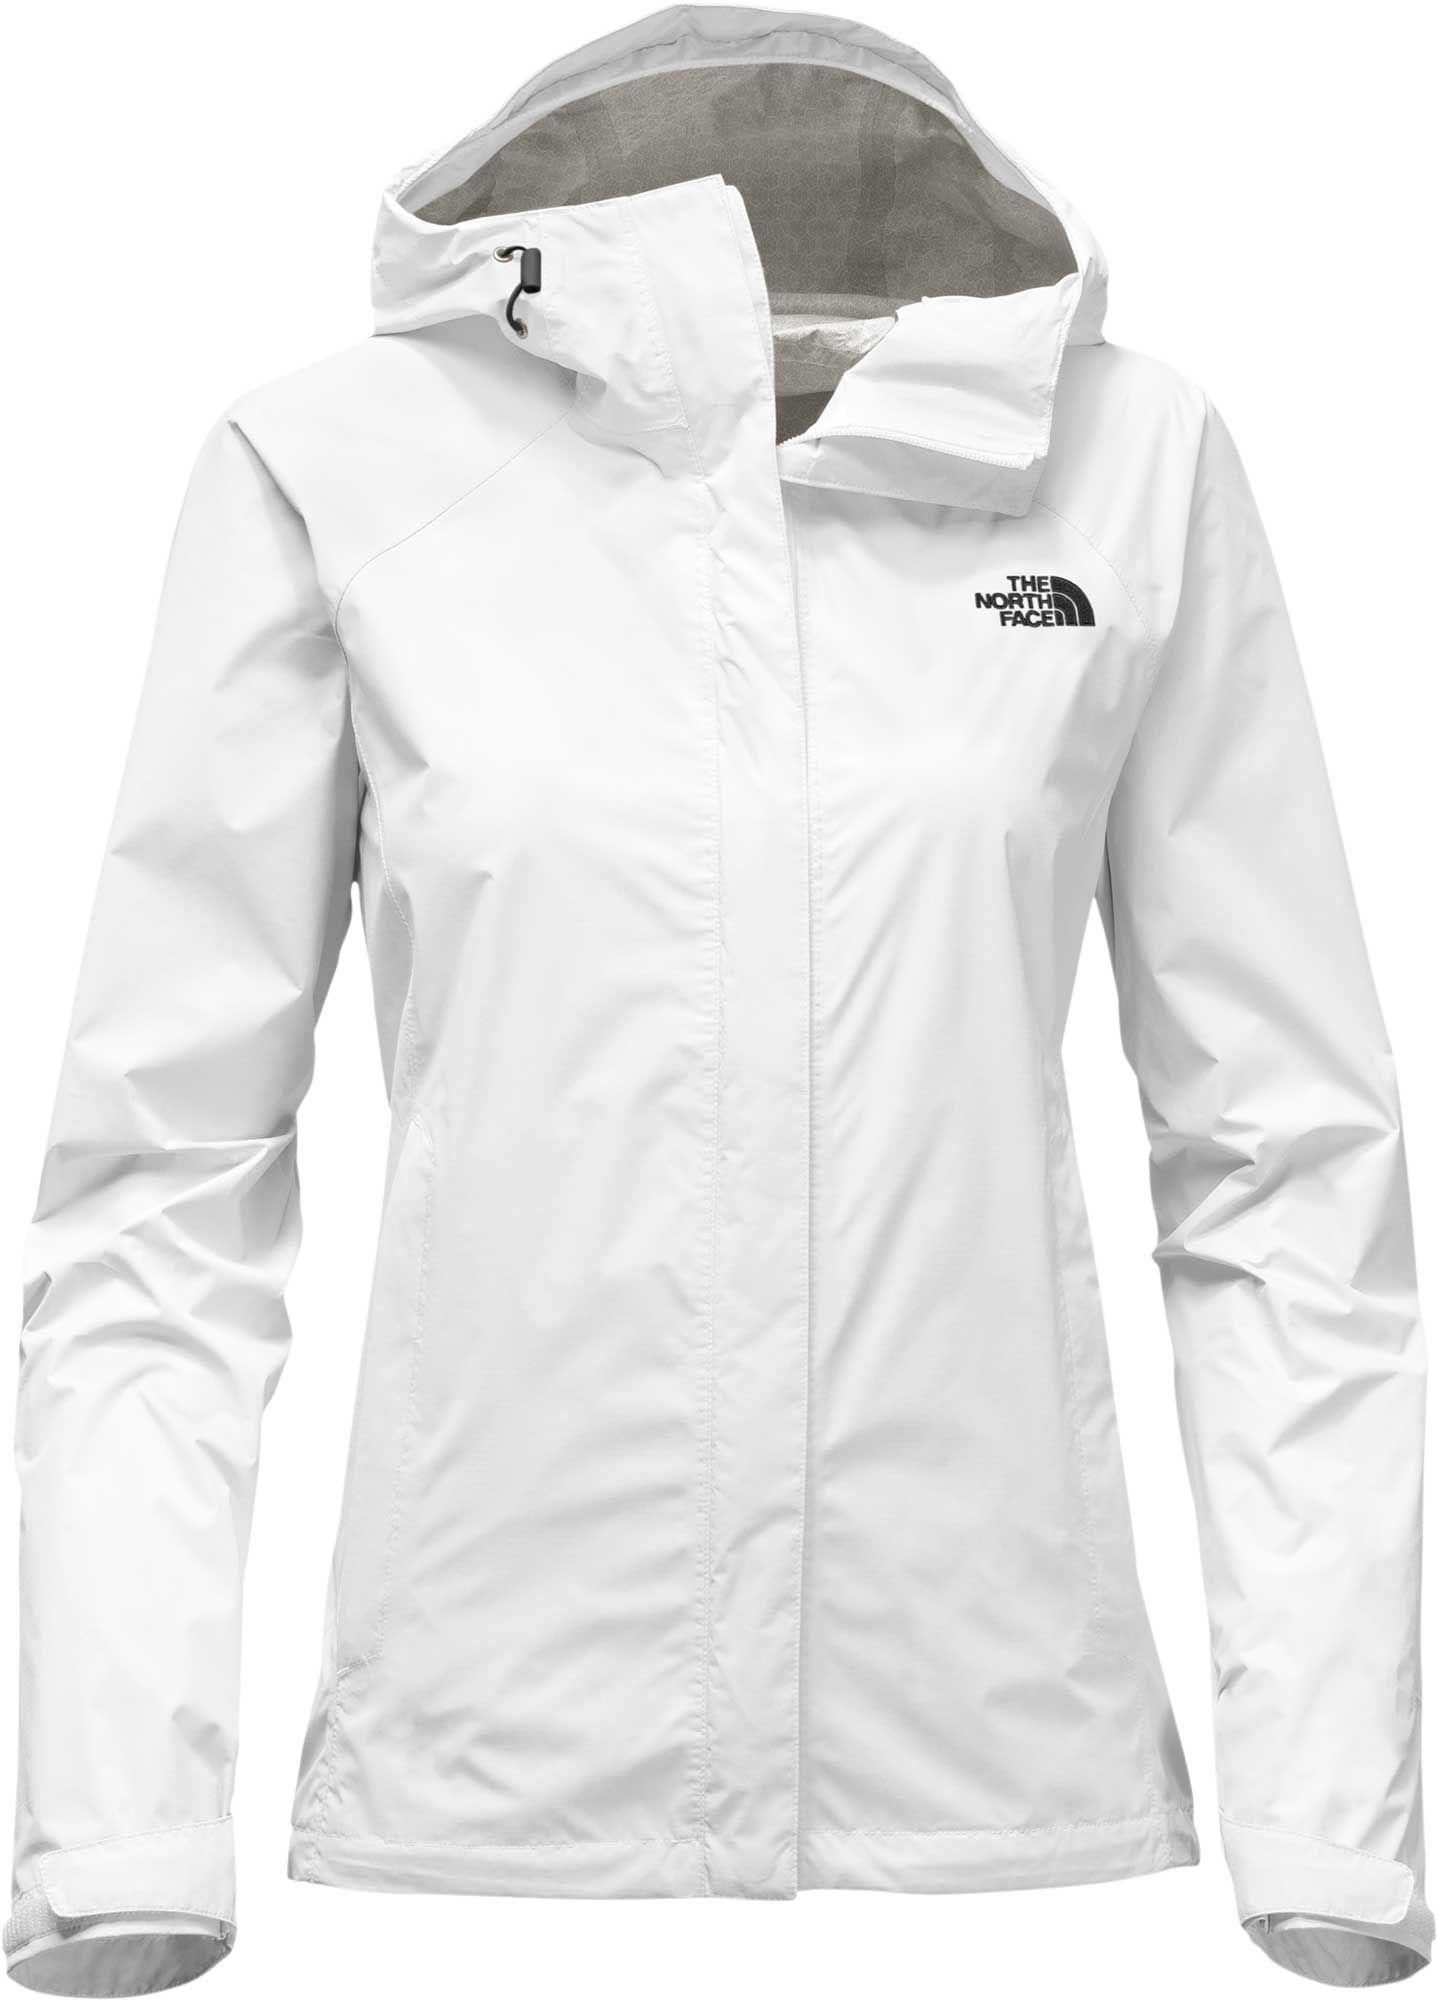 c4428ad626de Lyst - The North Face Venture Rain Jacket in White